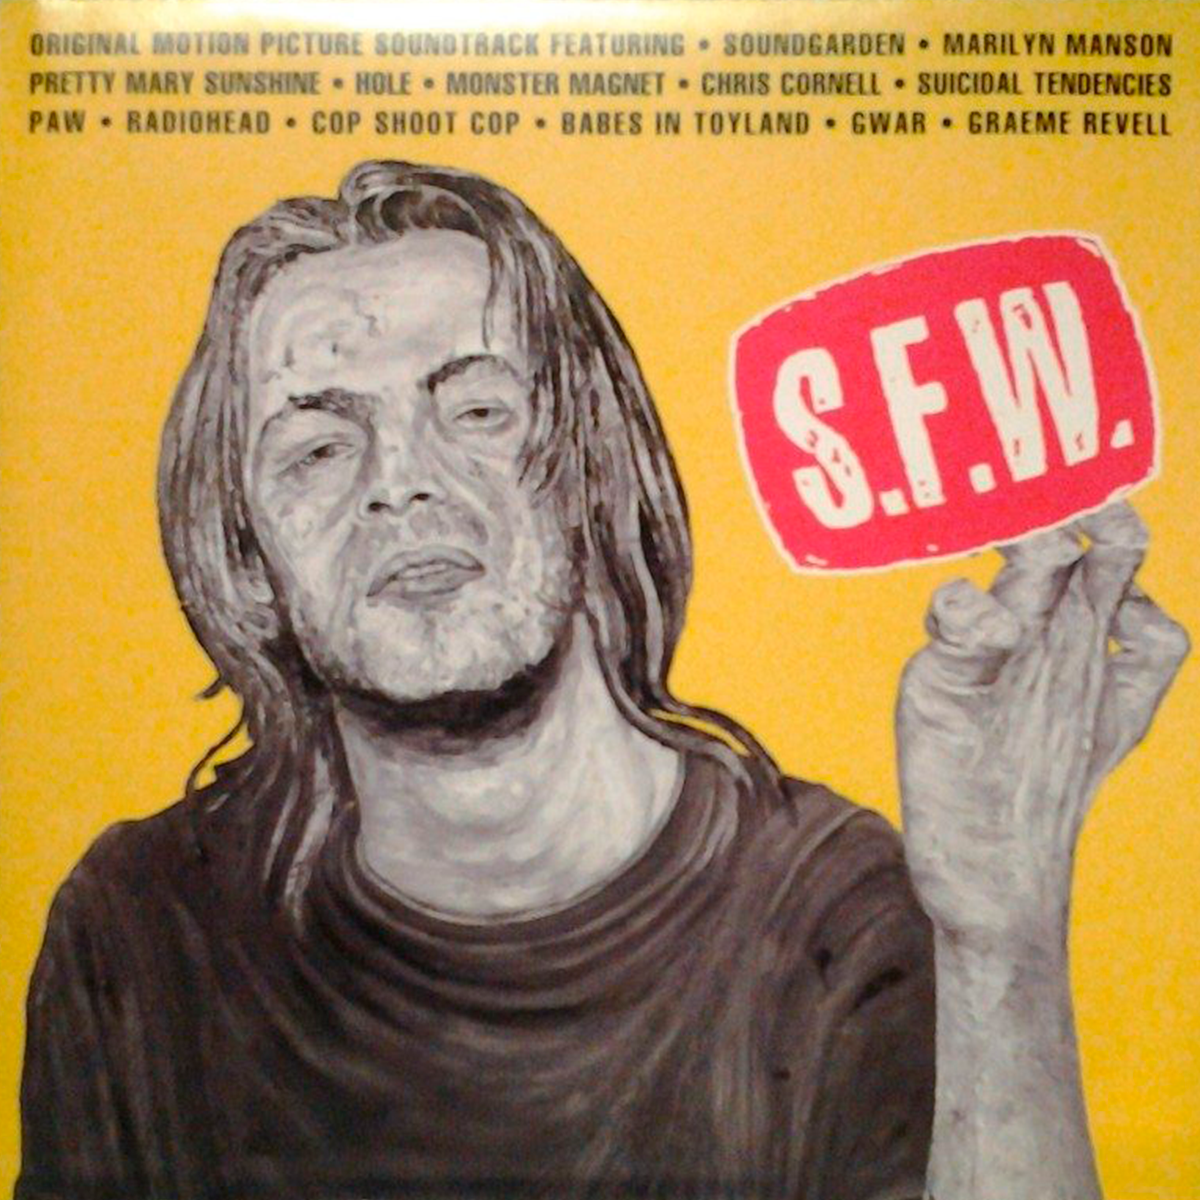 S.F.W. (So Fucking What)